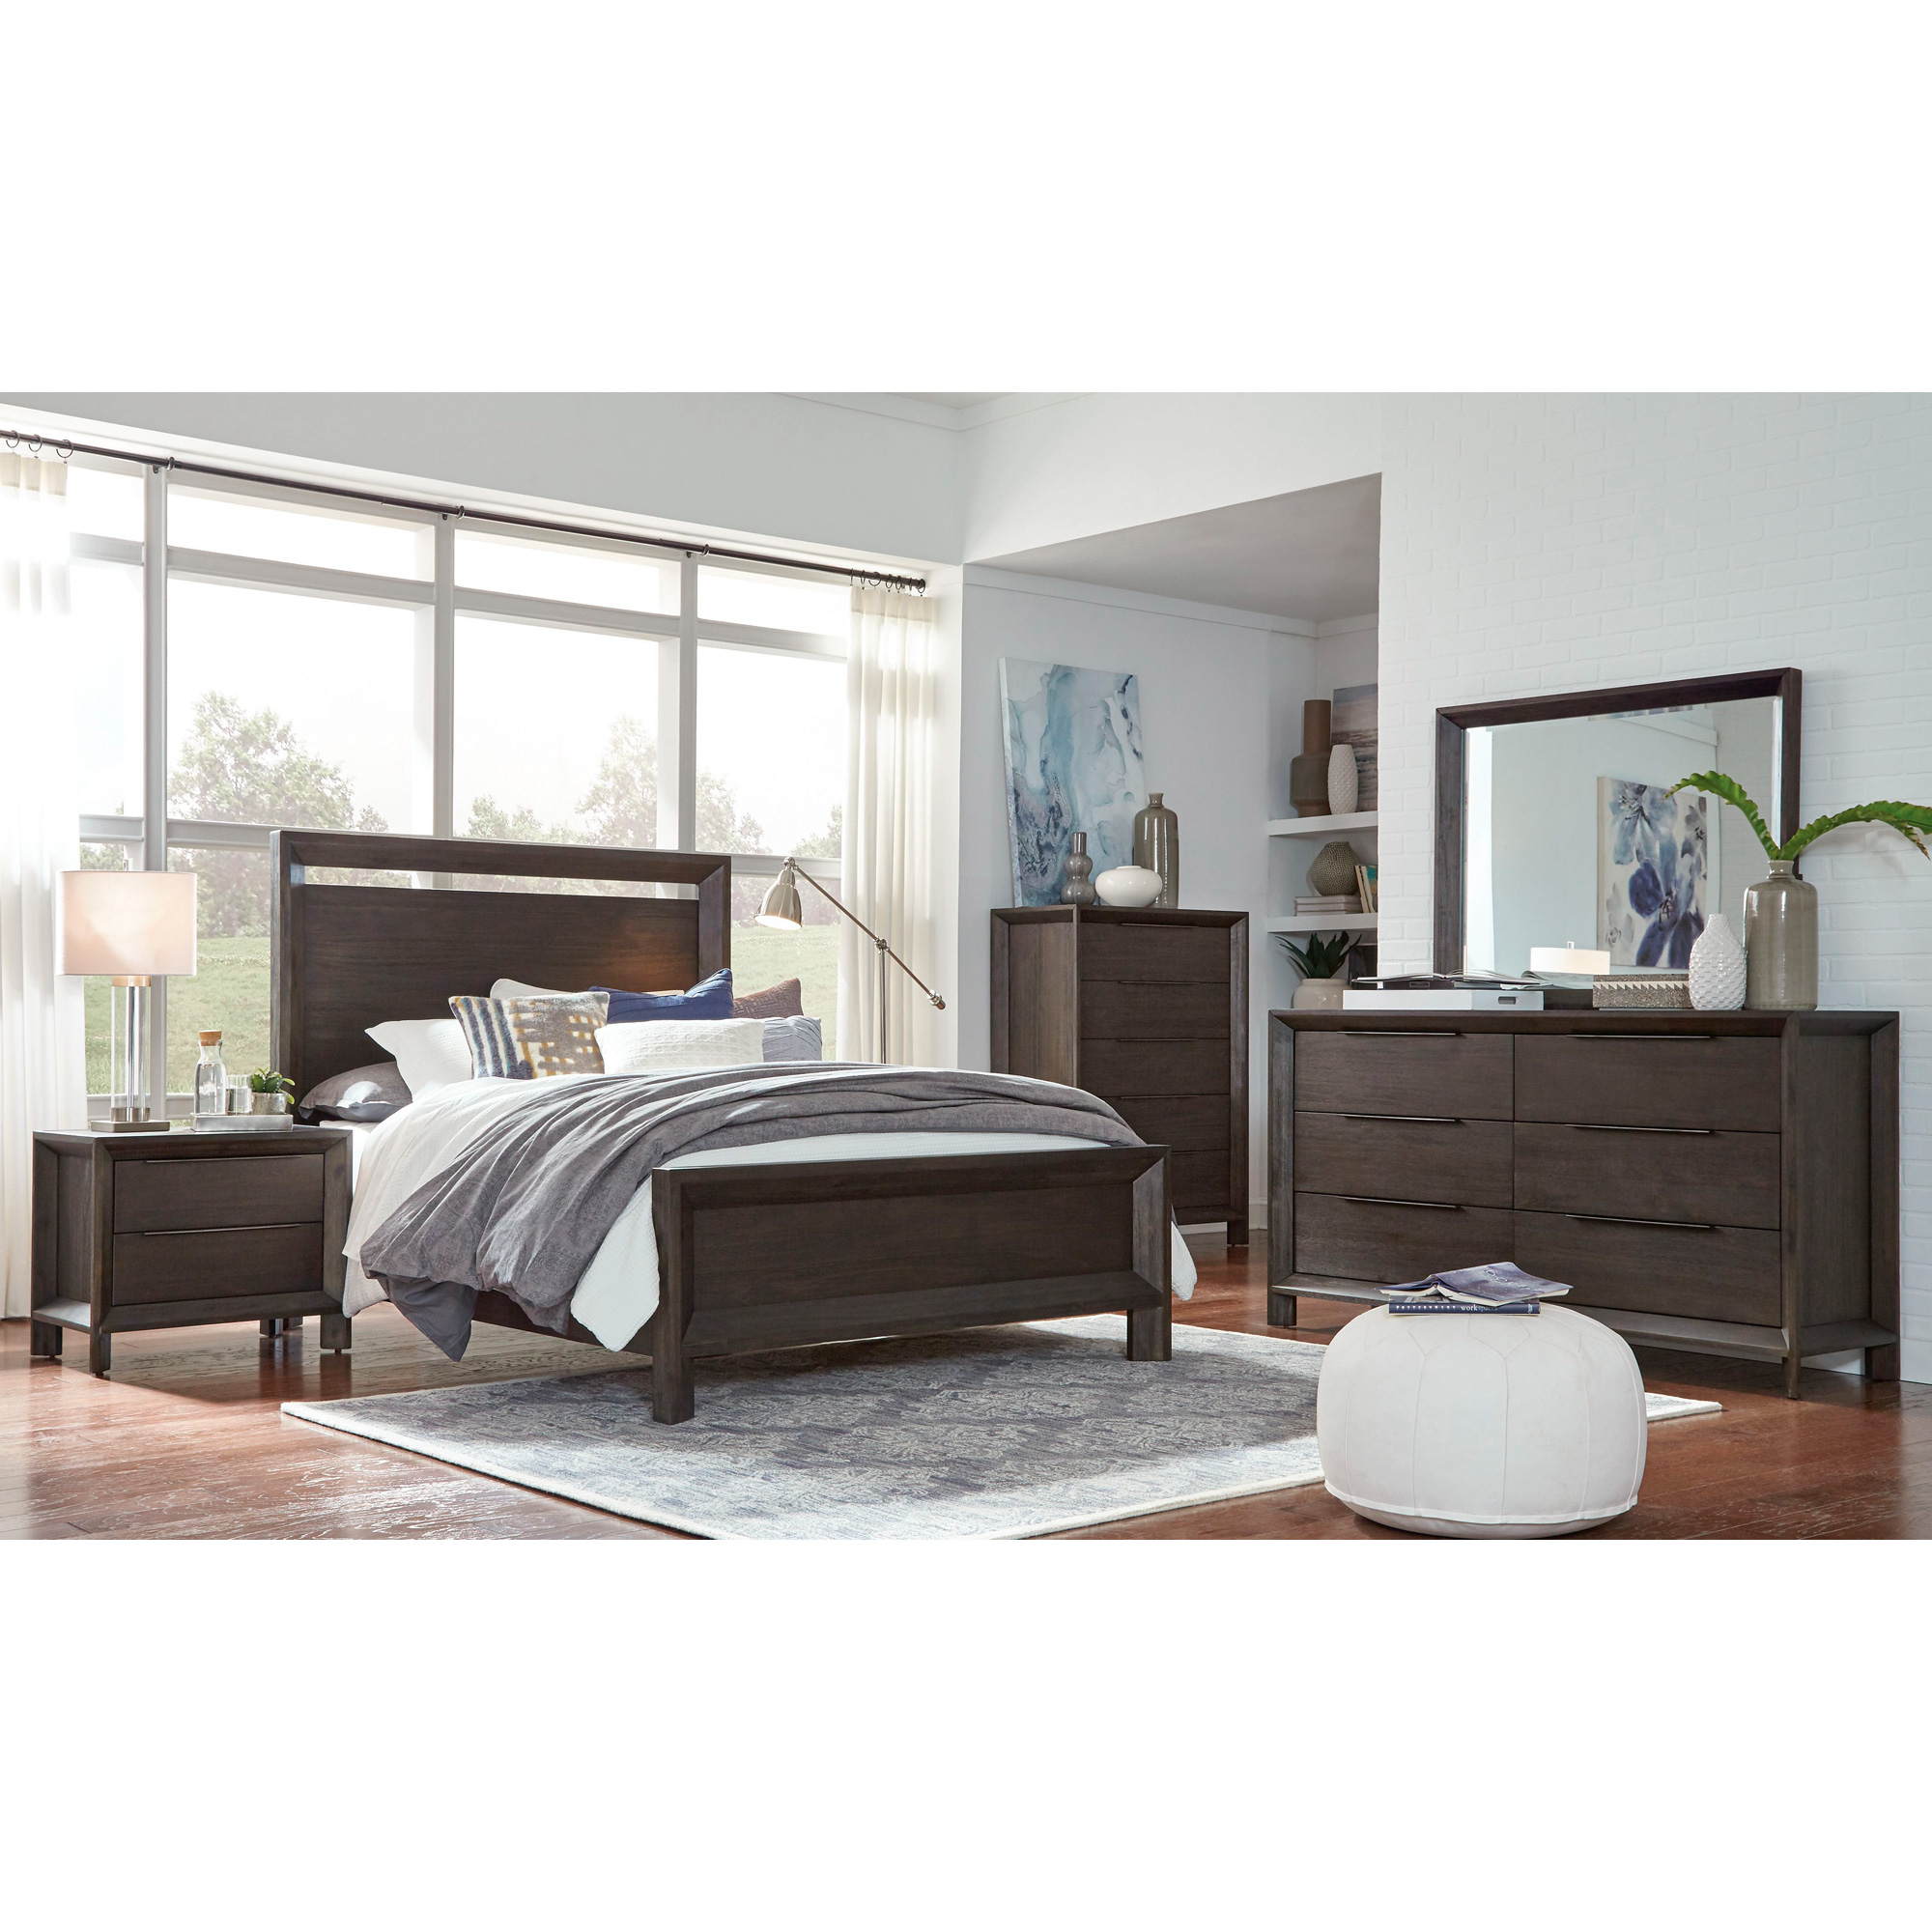 Modus Furniture International | Chloe Basalt Gray Queen 4 Piece Room Group Bedroom Set